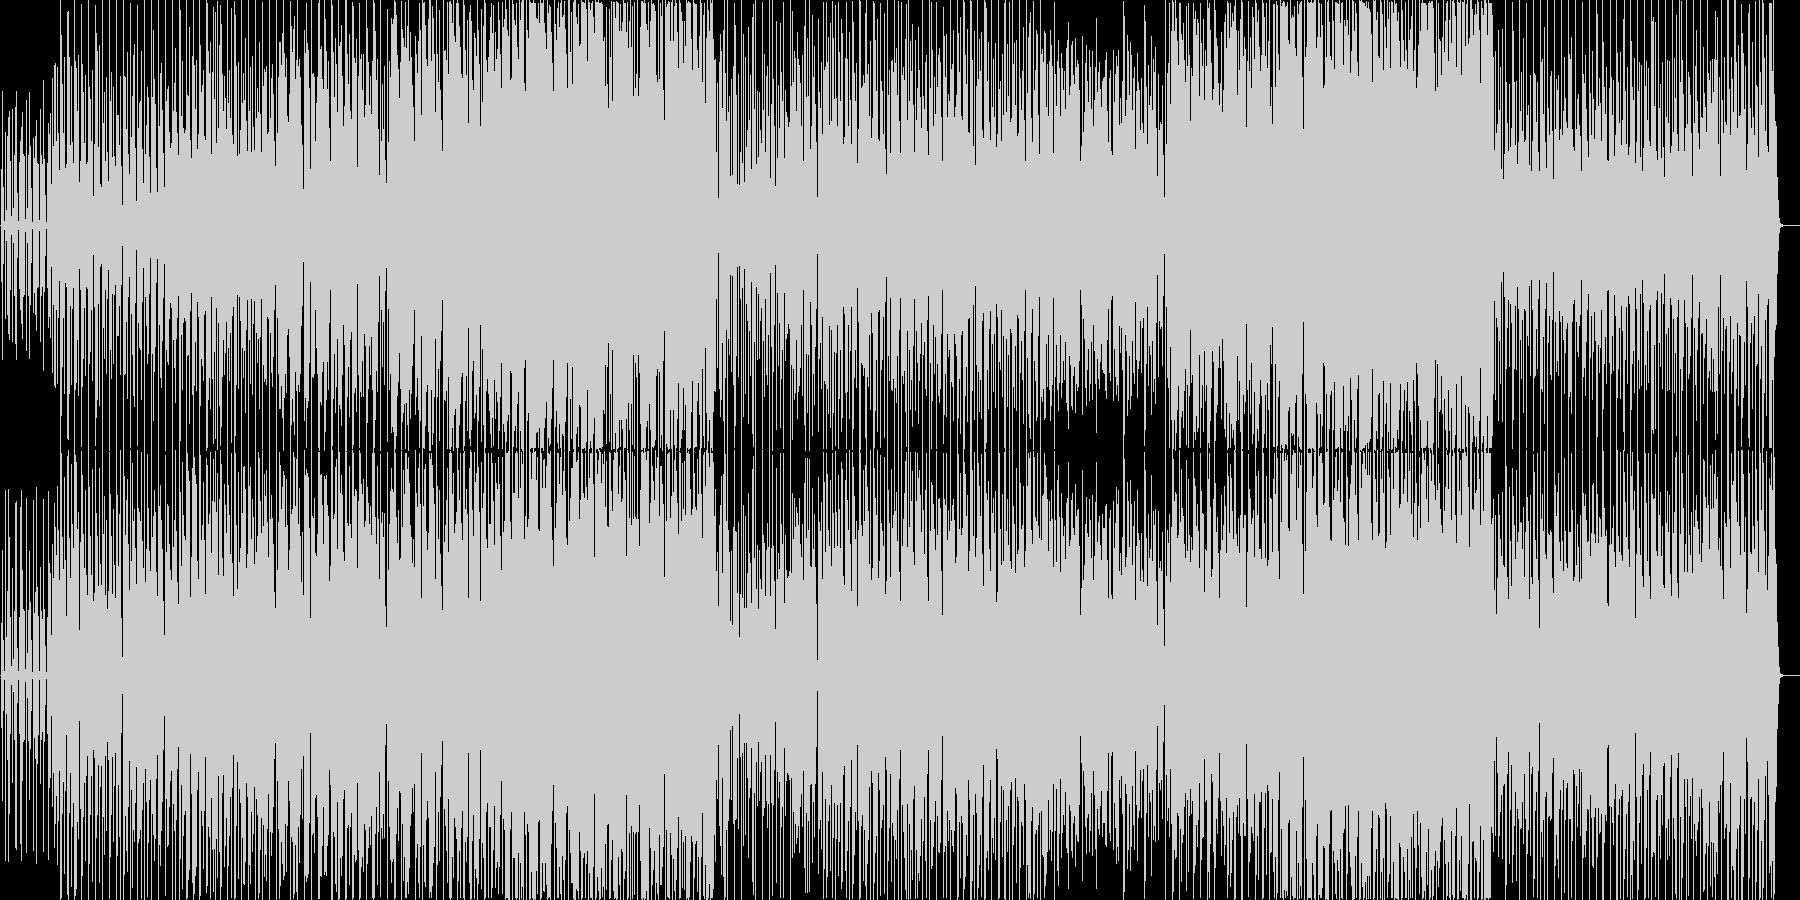 El laberintoの未再生の波形